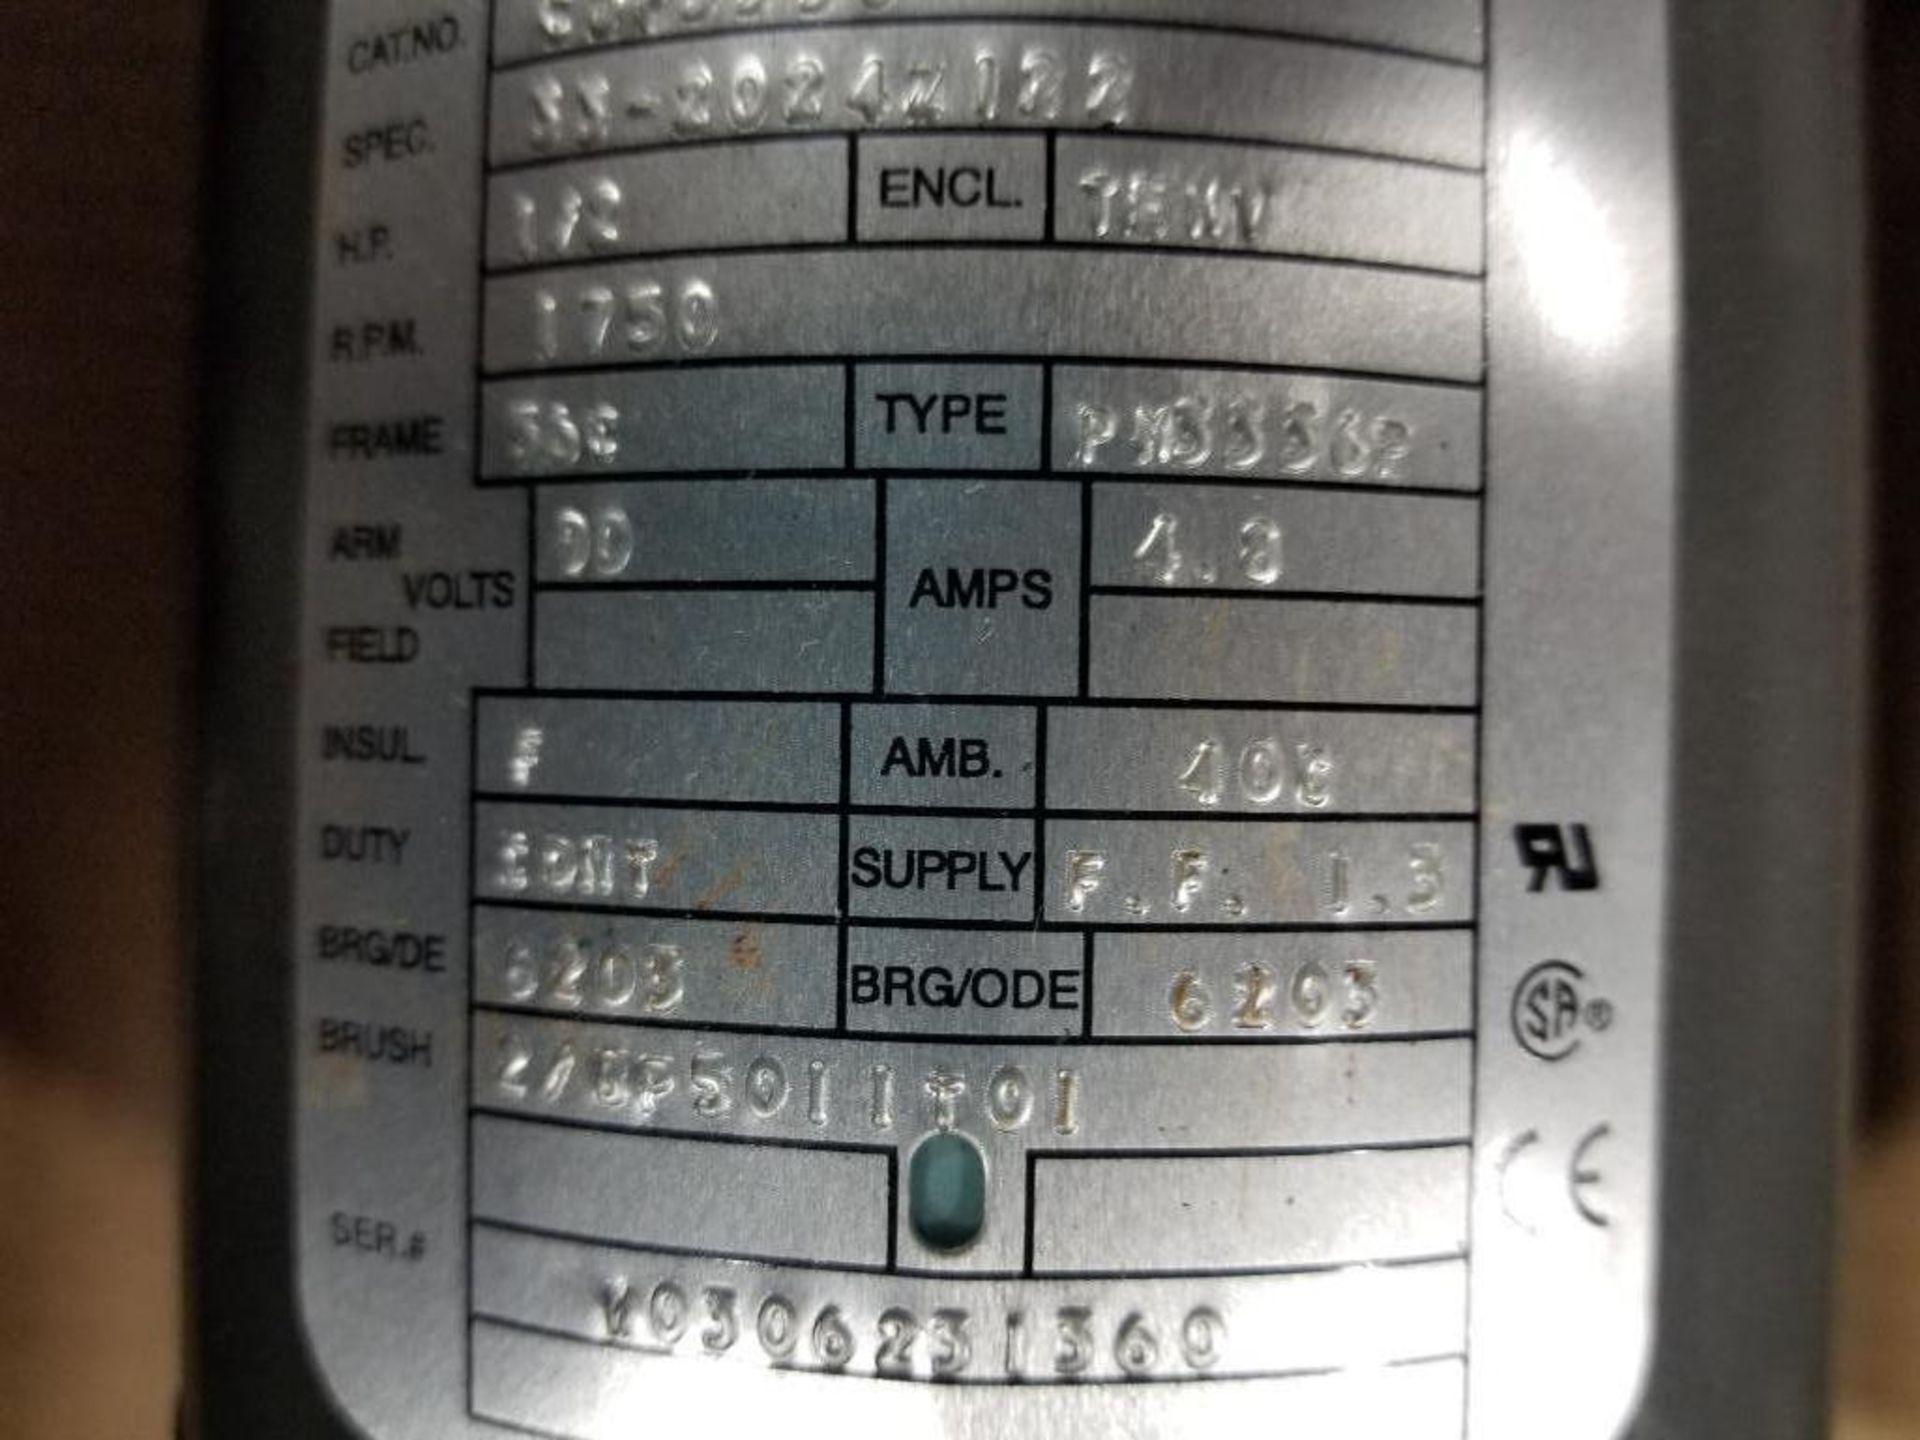 1/2HP Baldor industrial motor COP3330, 33-2024Z122. 1750RPM, 56C-Frame. - Image 3 of 6